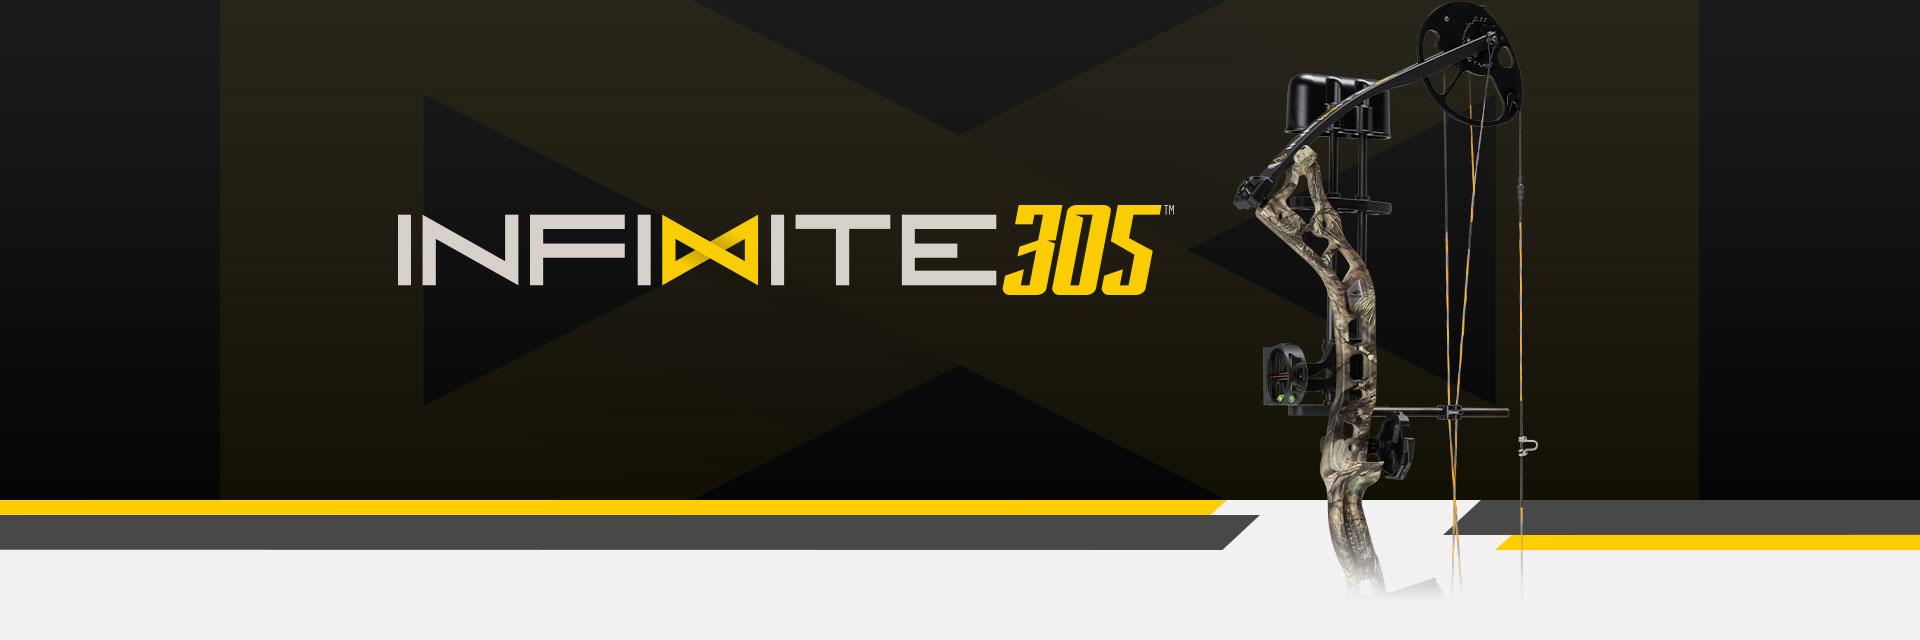 infinite 305 lifestyle header image